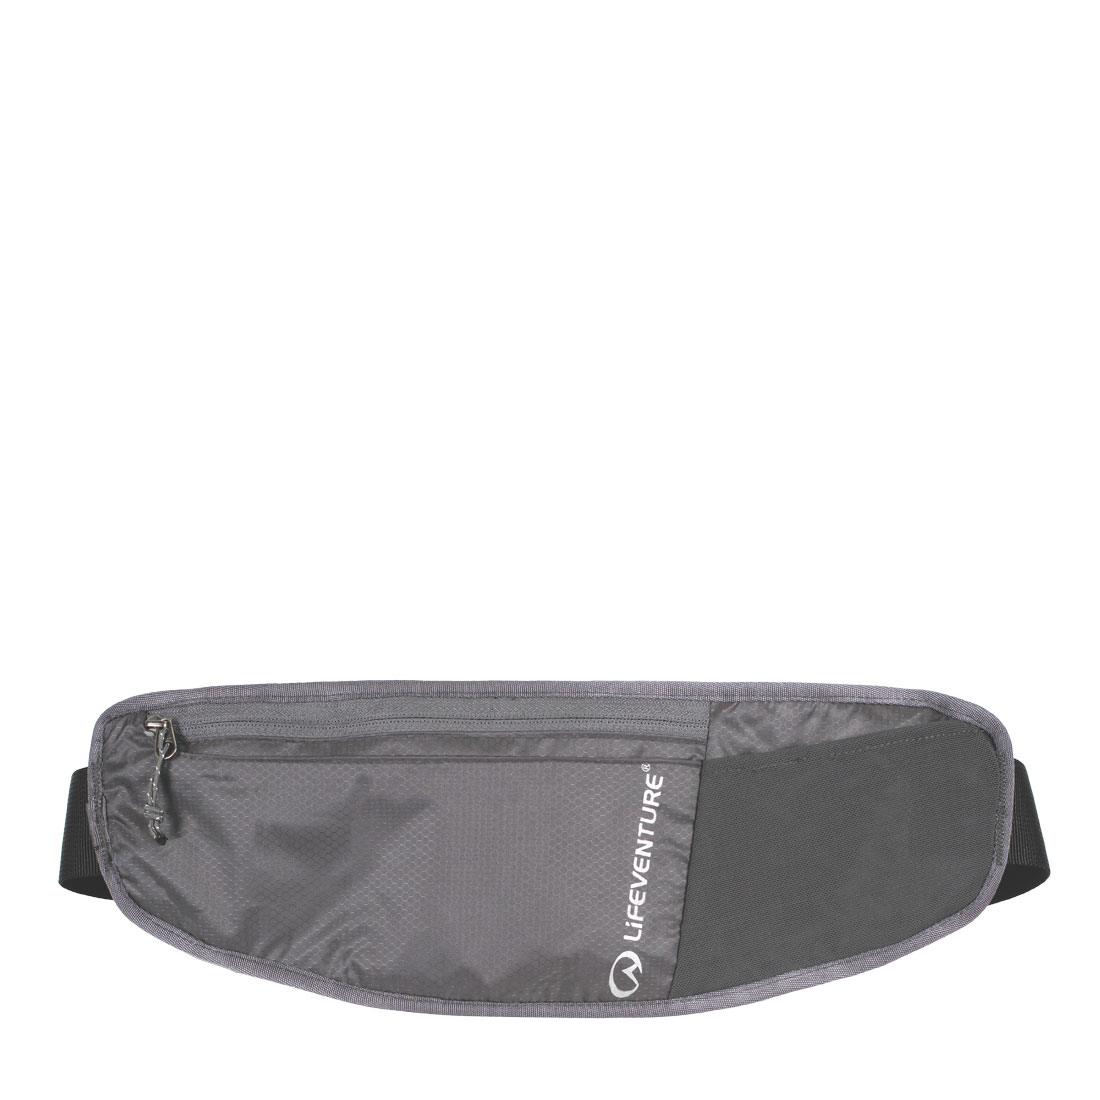 Softfibre Lite Grey Travel Towel (large)